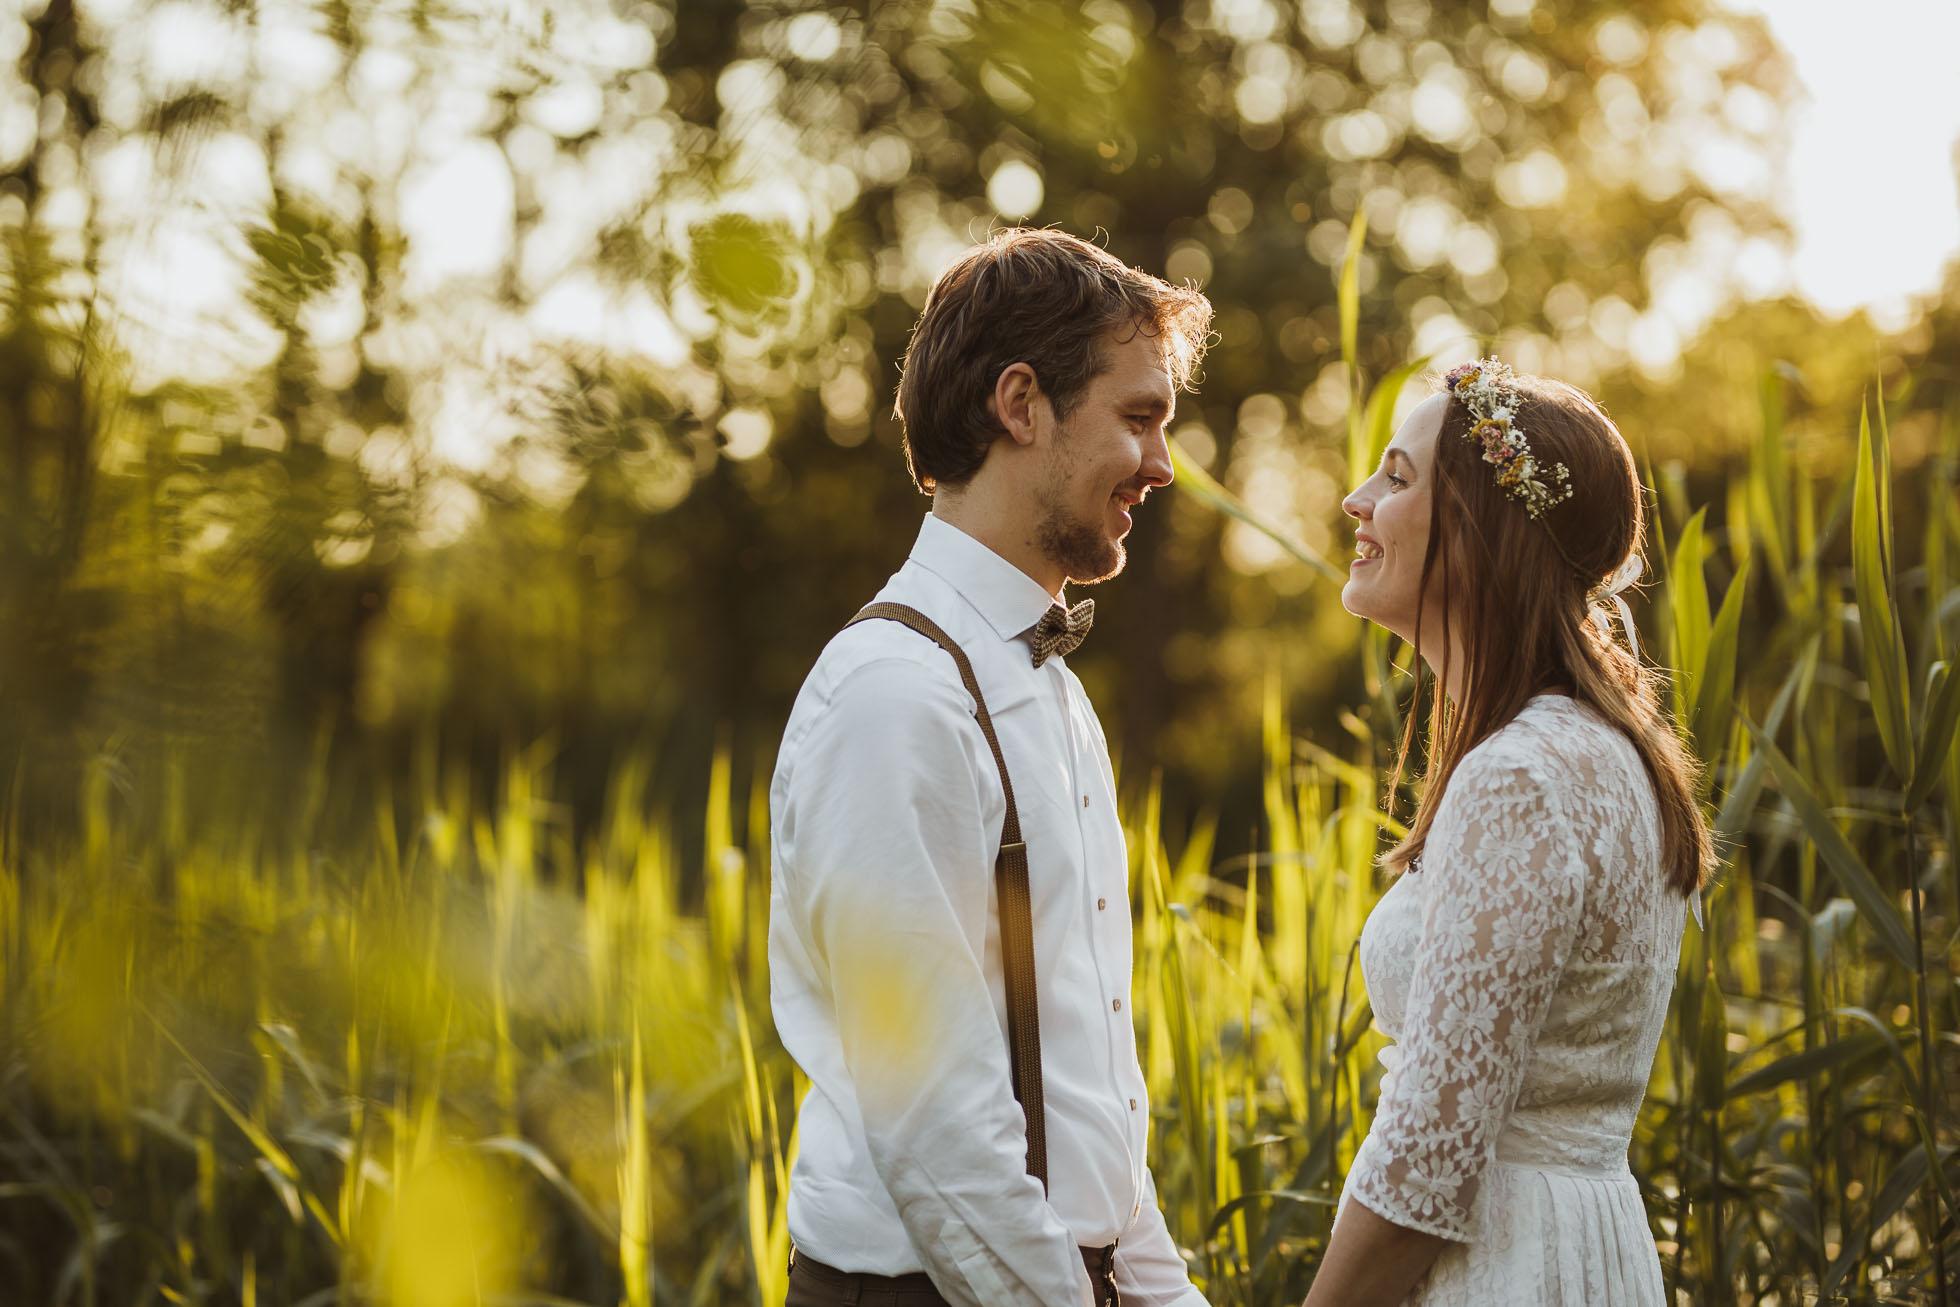 utrecht-wedding-photographer-128.jpg